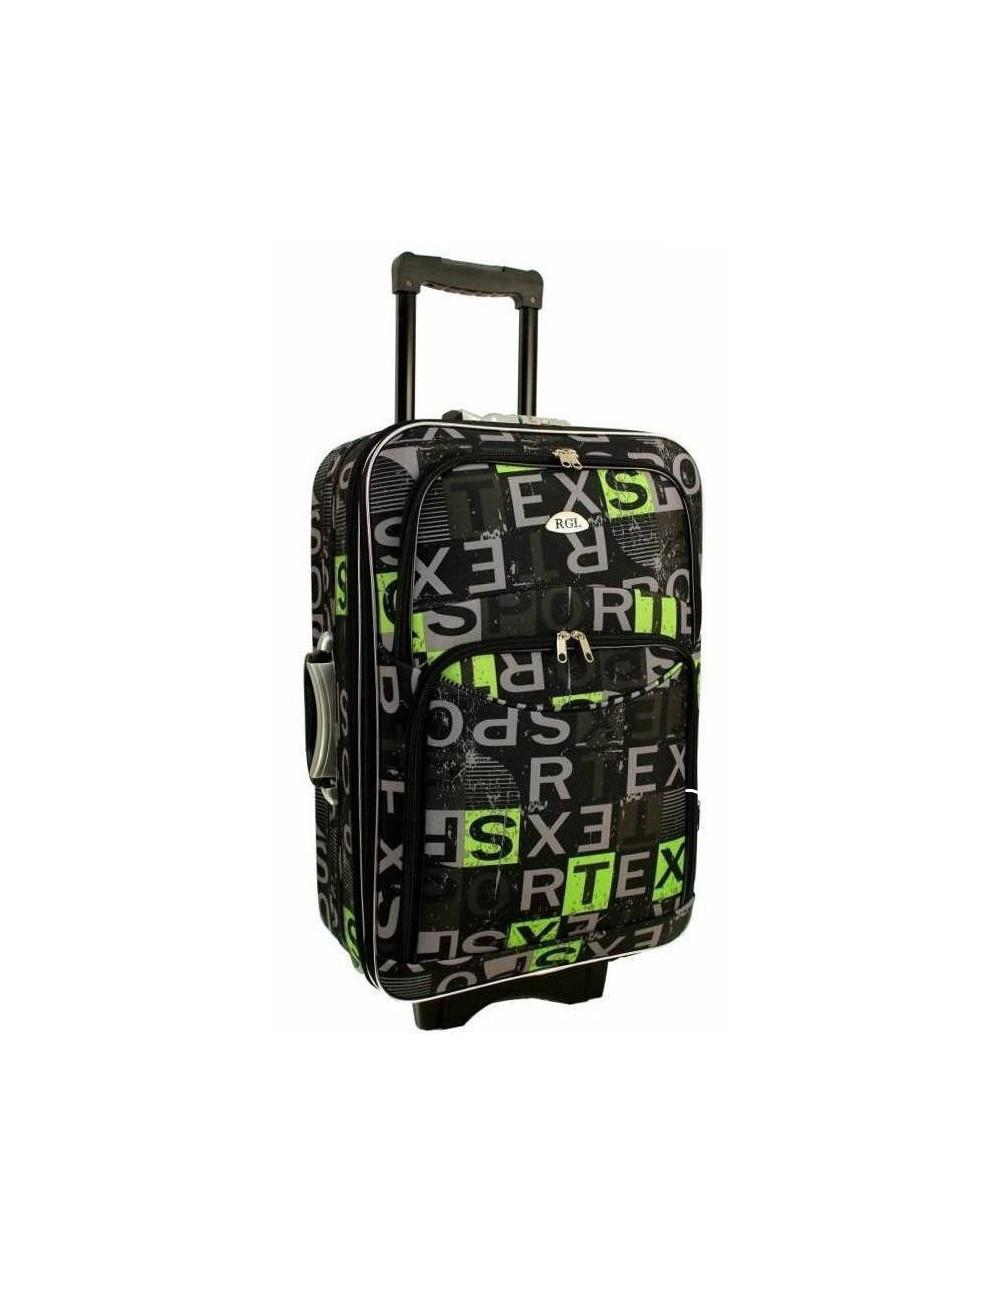 Mała walizka podróżna na kółkach 773 M - kolor 8